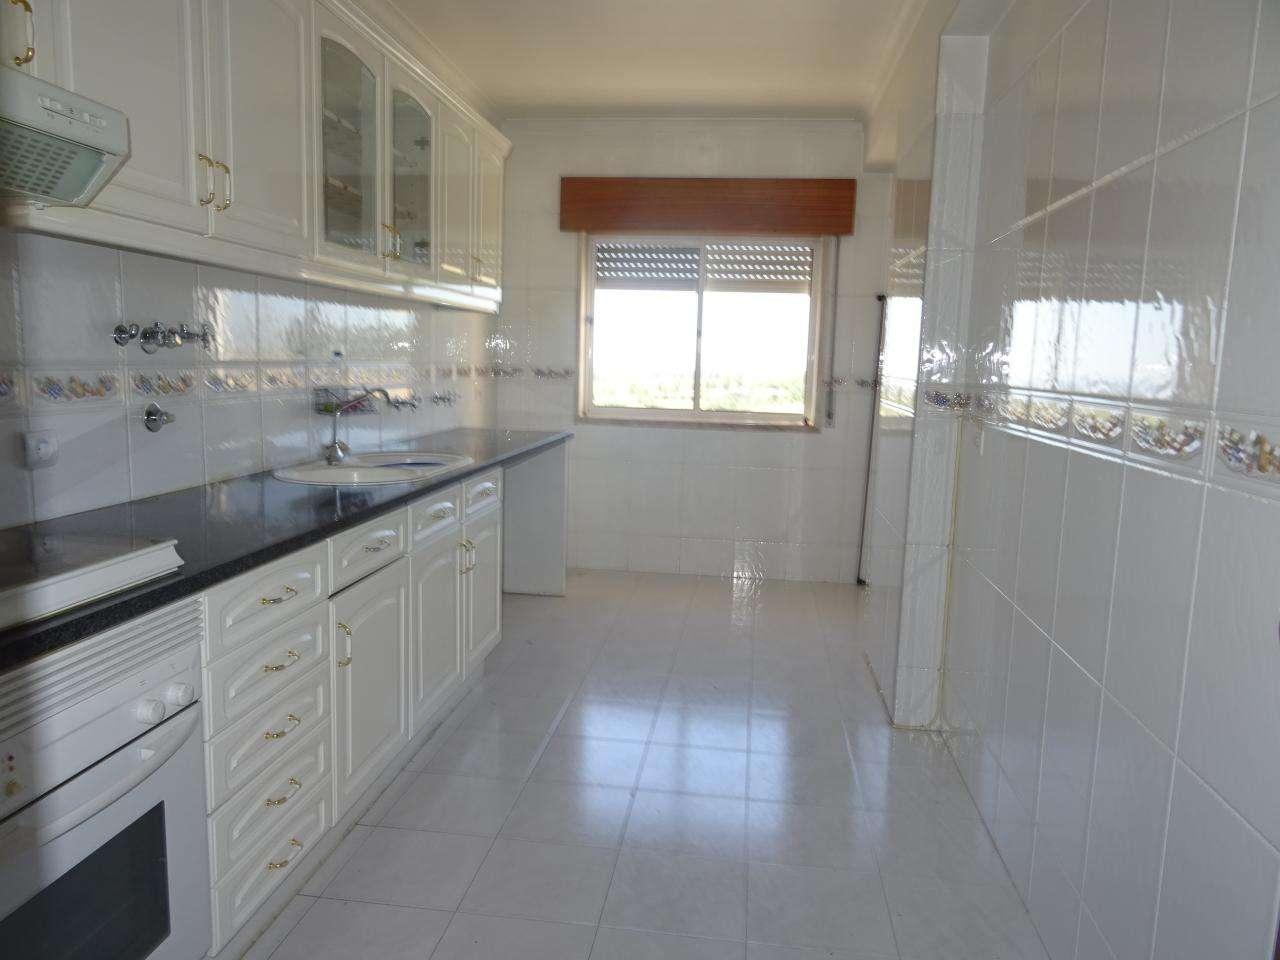 Apartamento para comprar, Porto Salvo, Oeiras, Lisboa - Foto 3